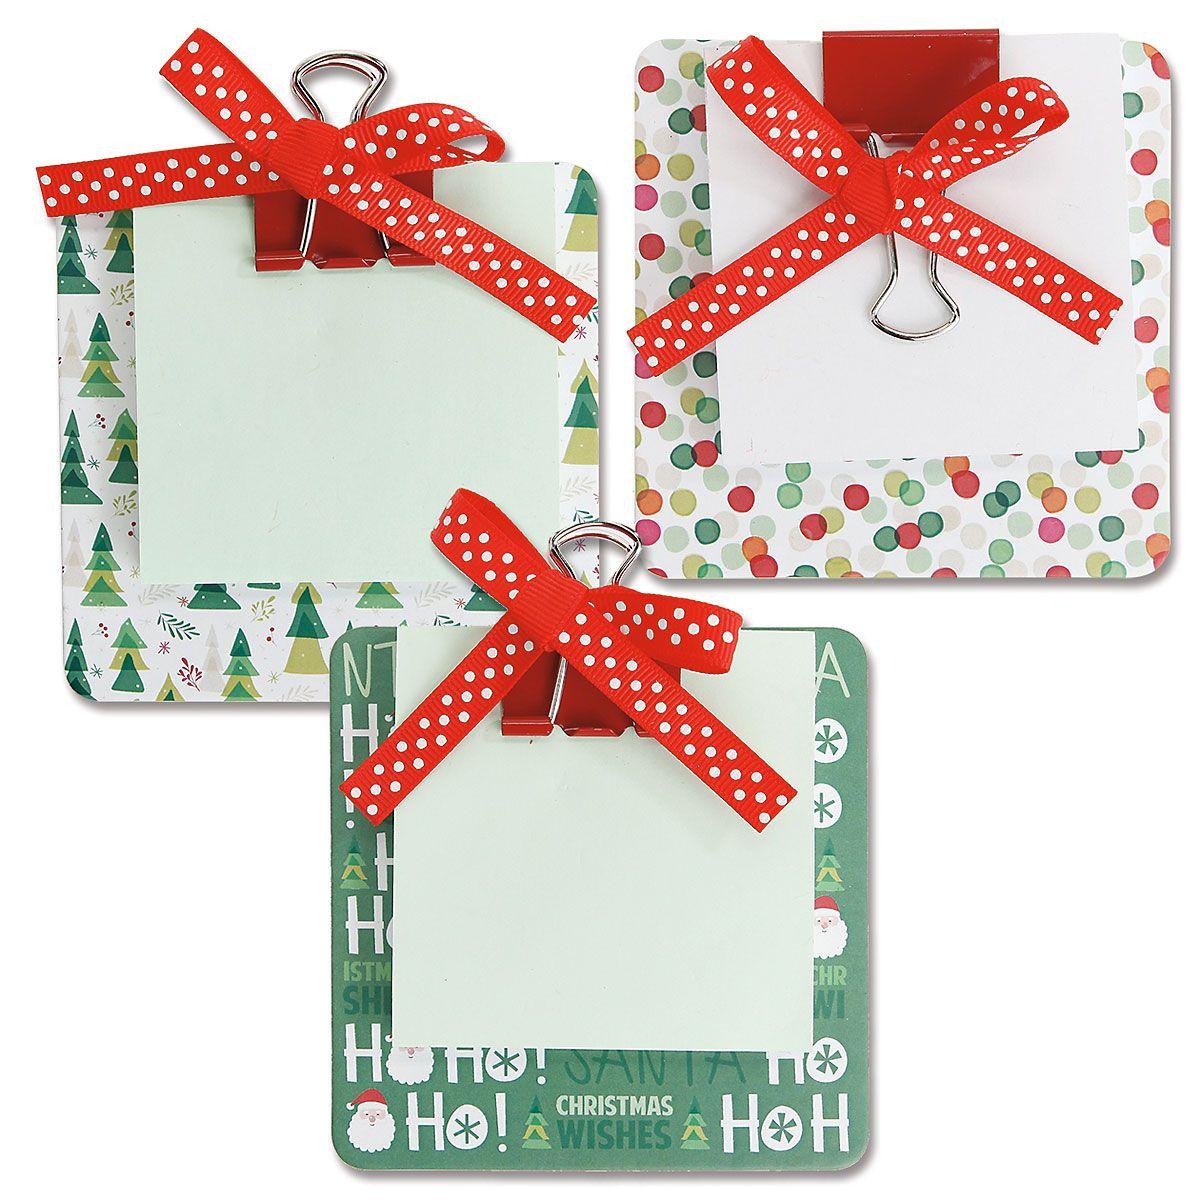 Christmas Cheer Coaster Notes